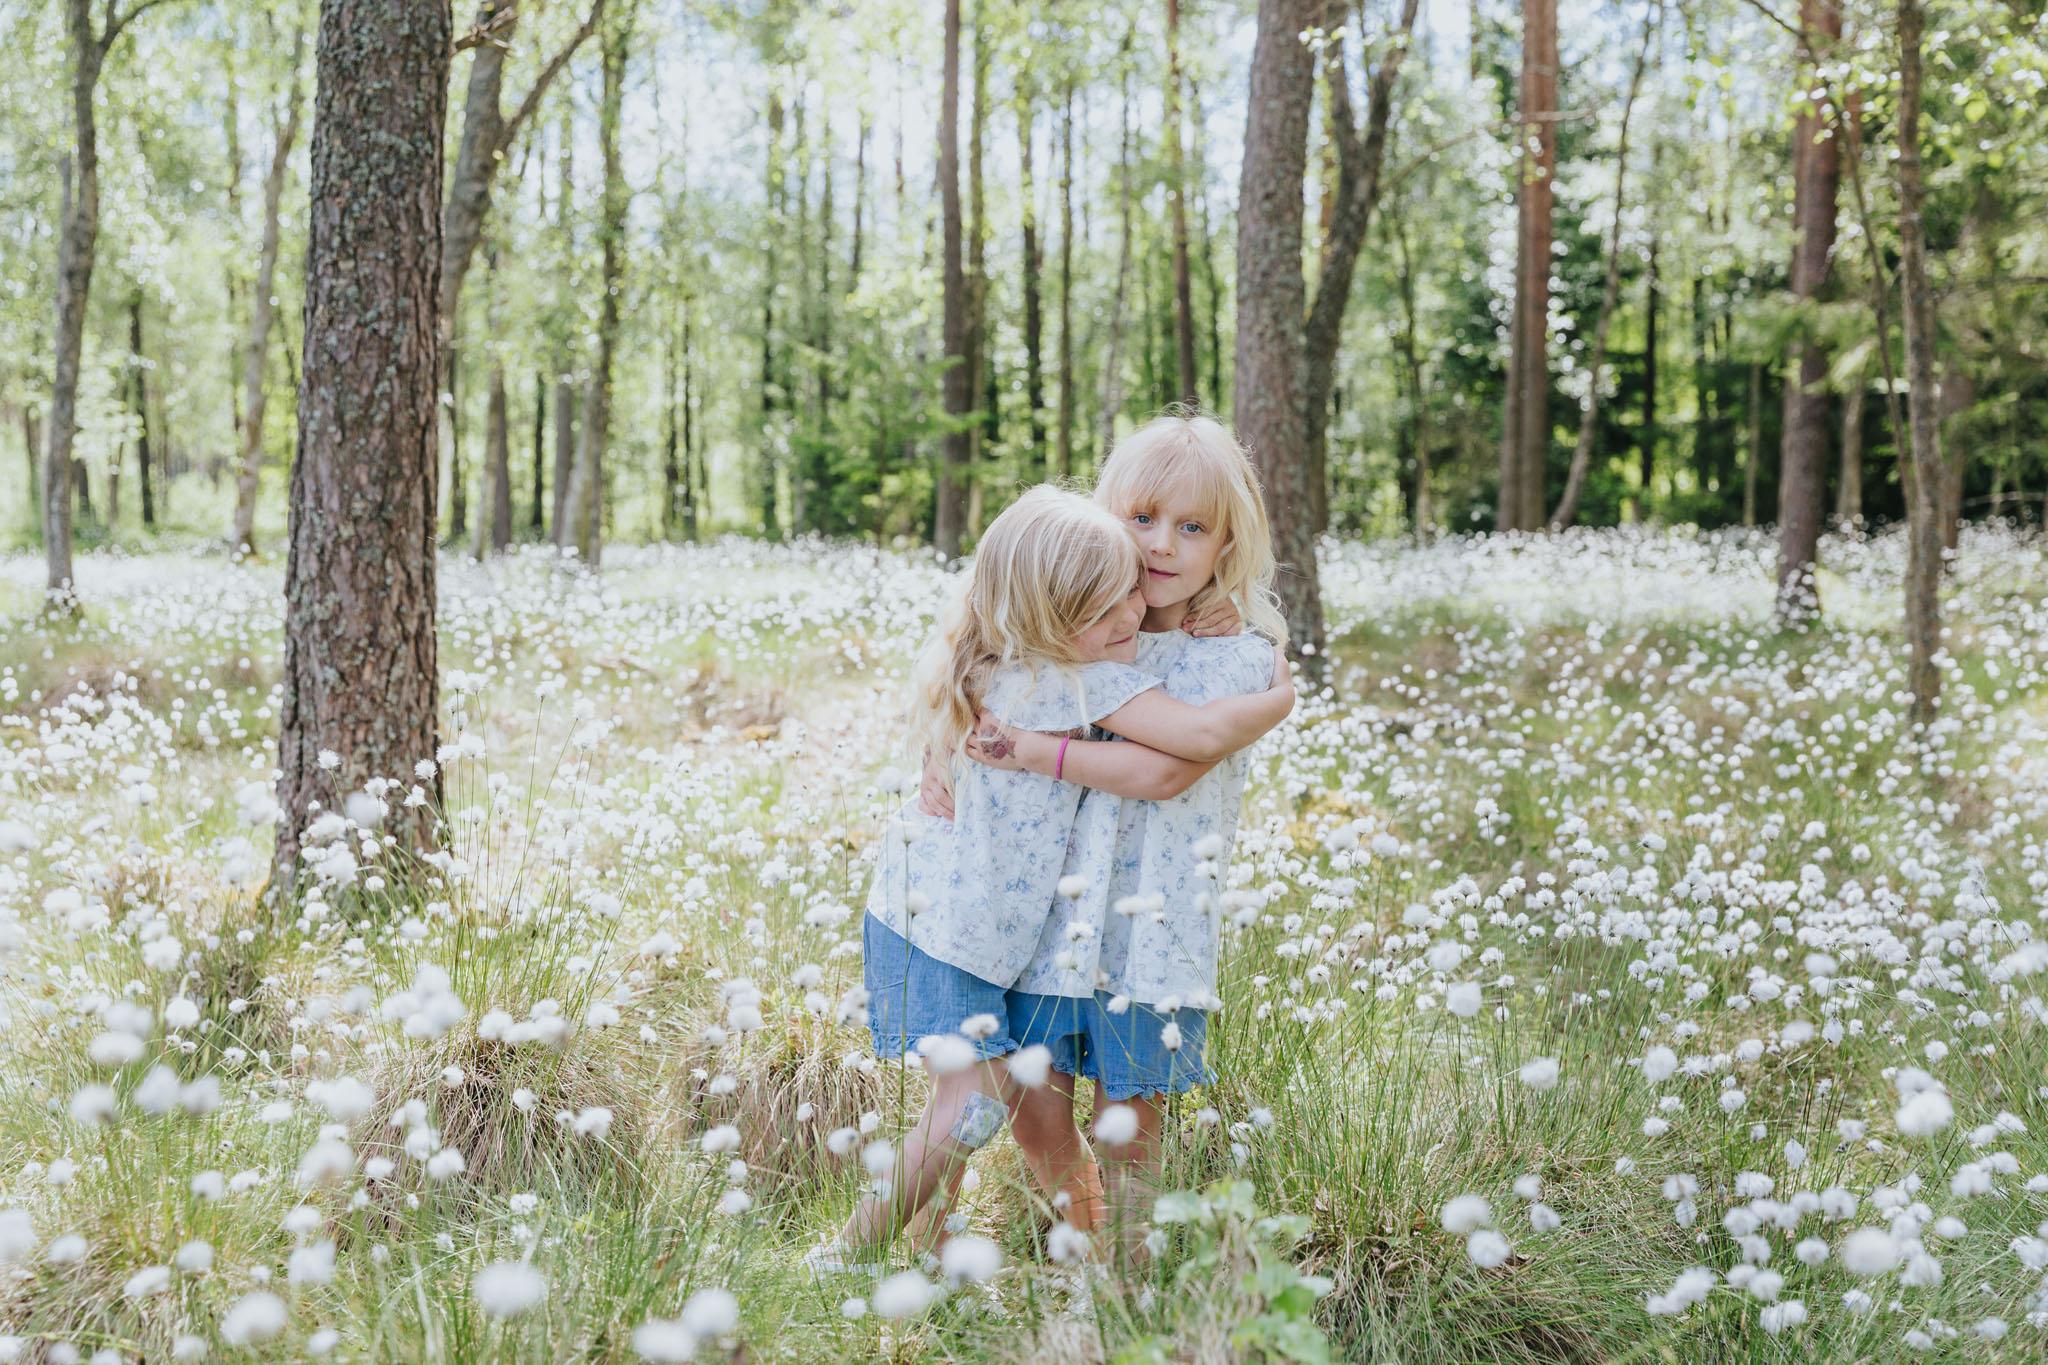 2018 05 20  Familjefotografering Almarsson, Fotograf Emy, 53.jpg